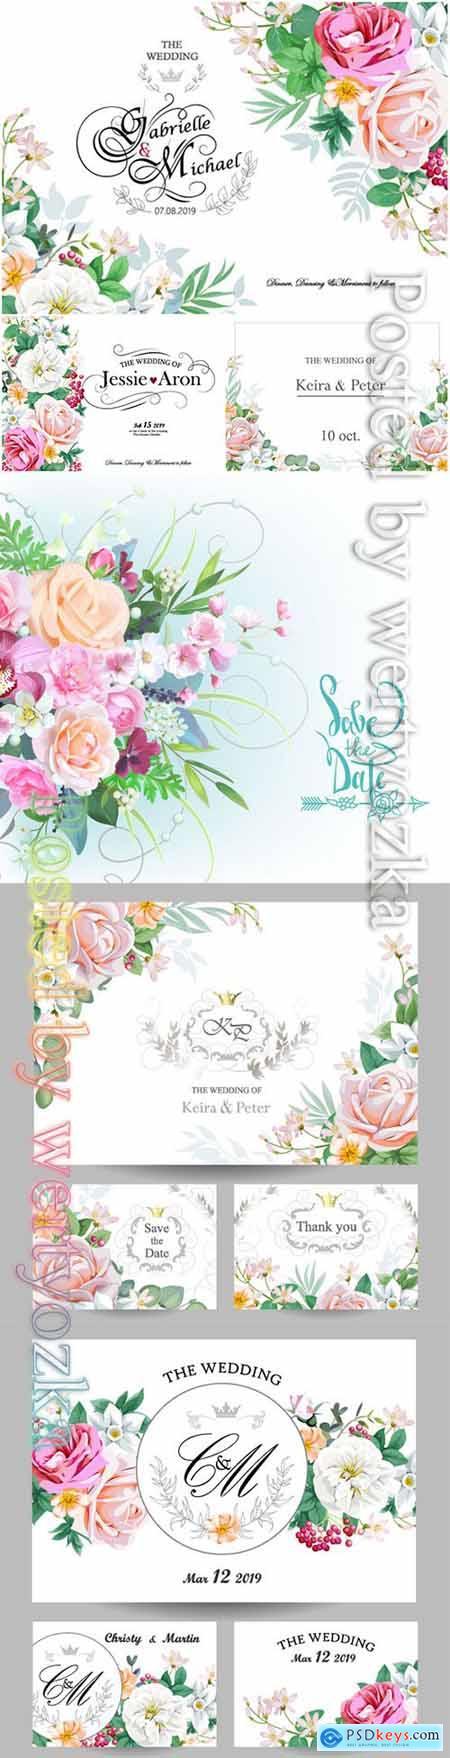 Wedding floral invitation vector card